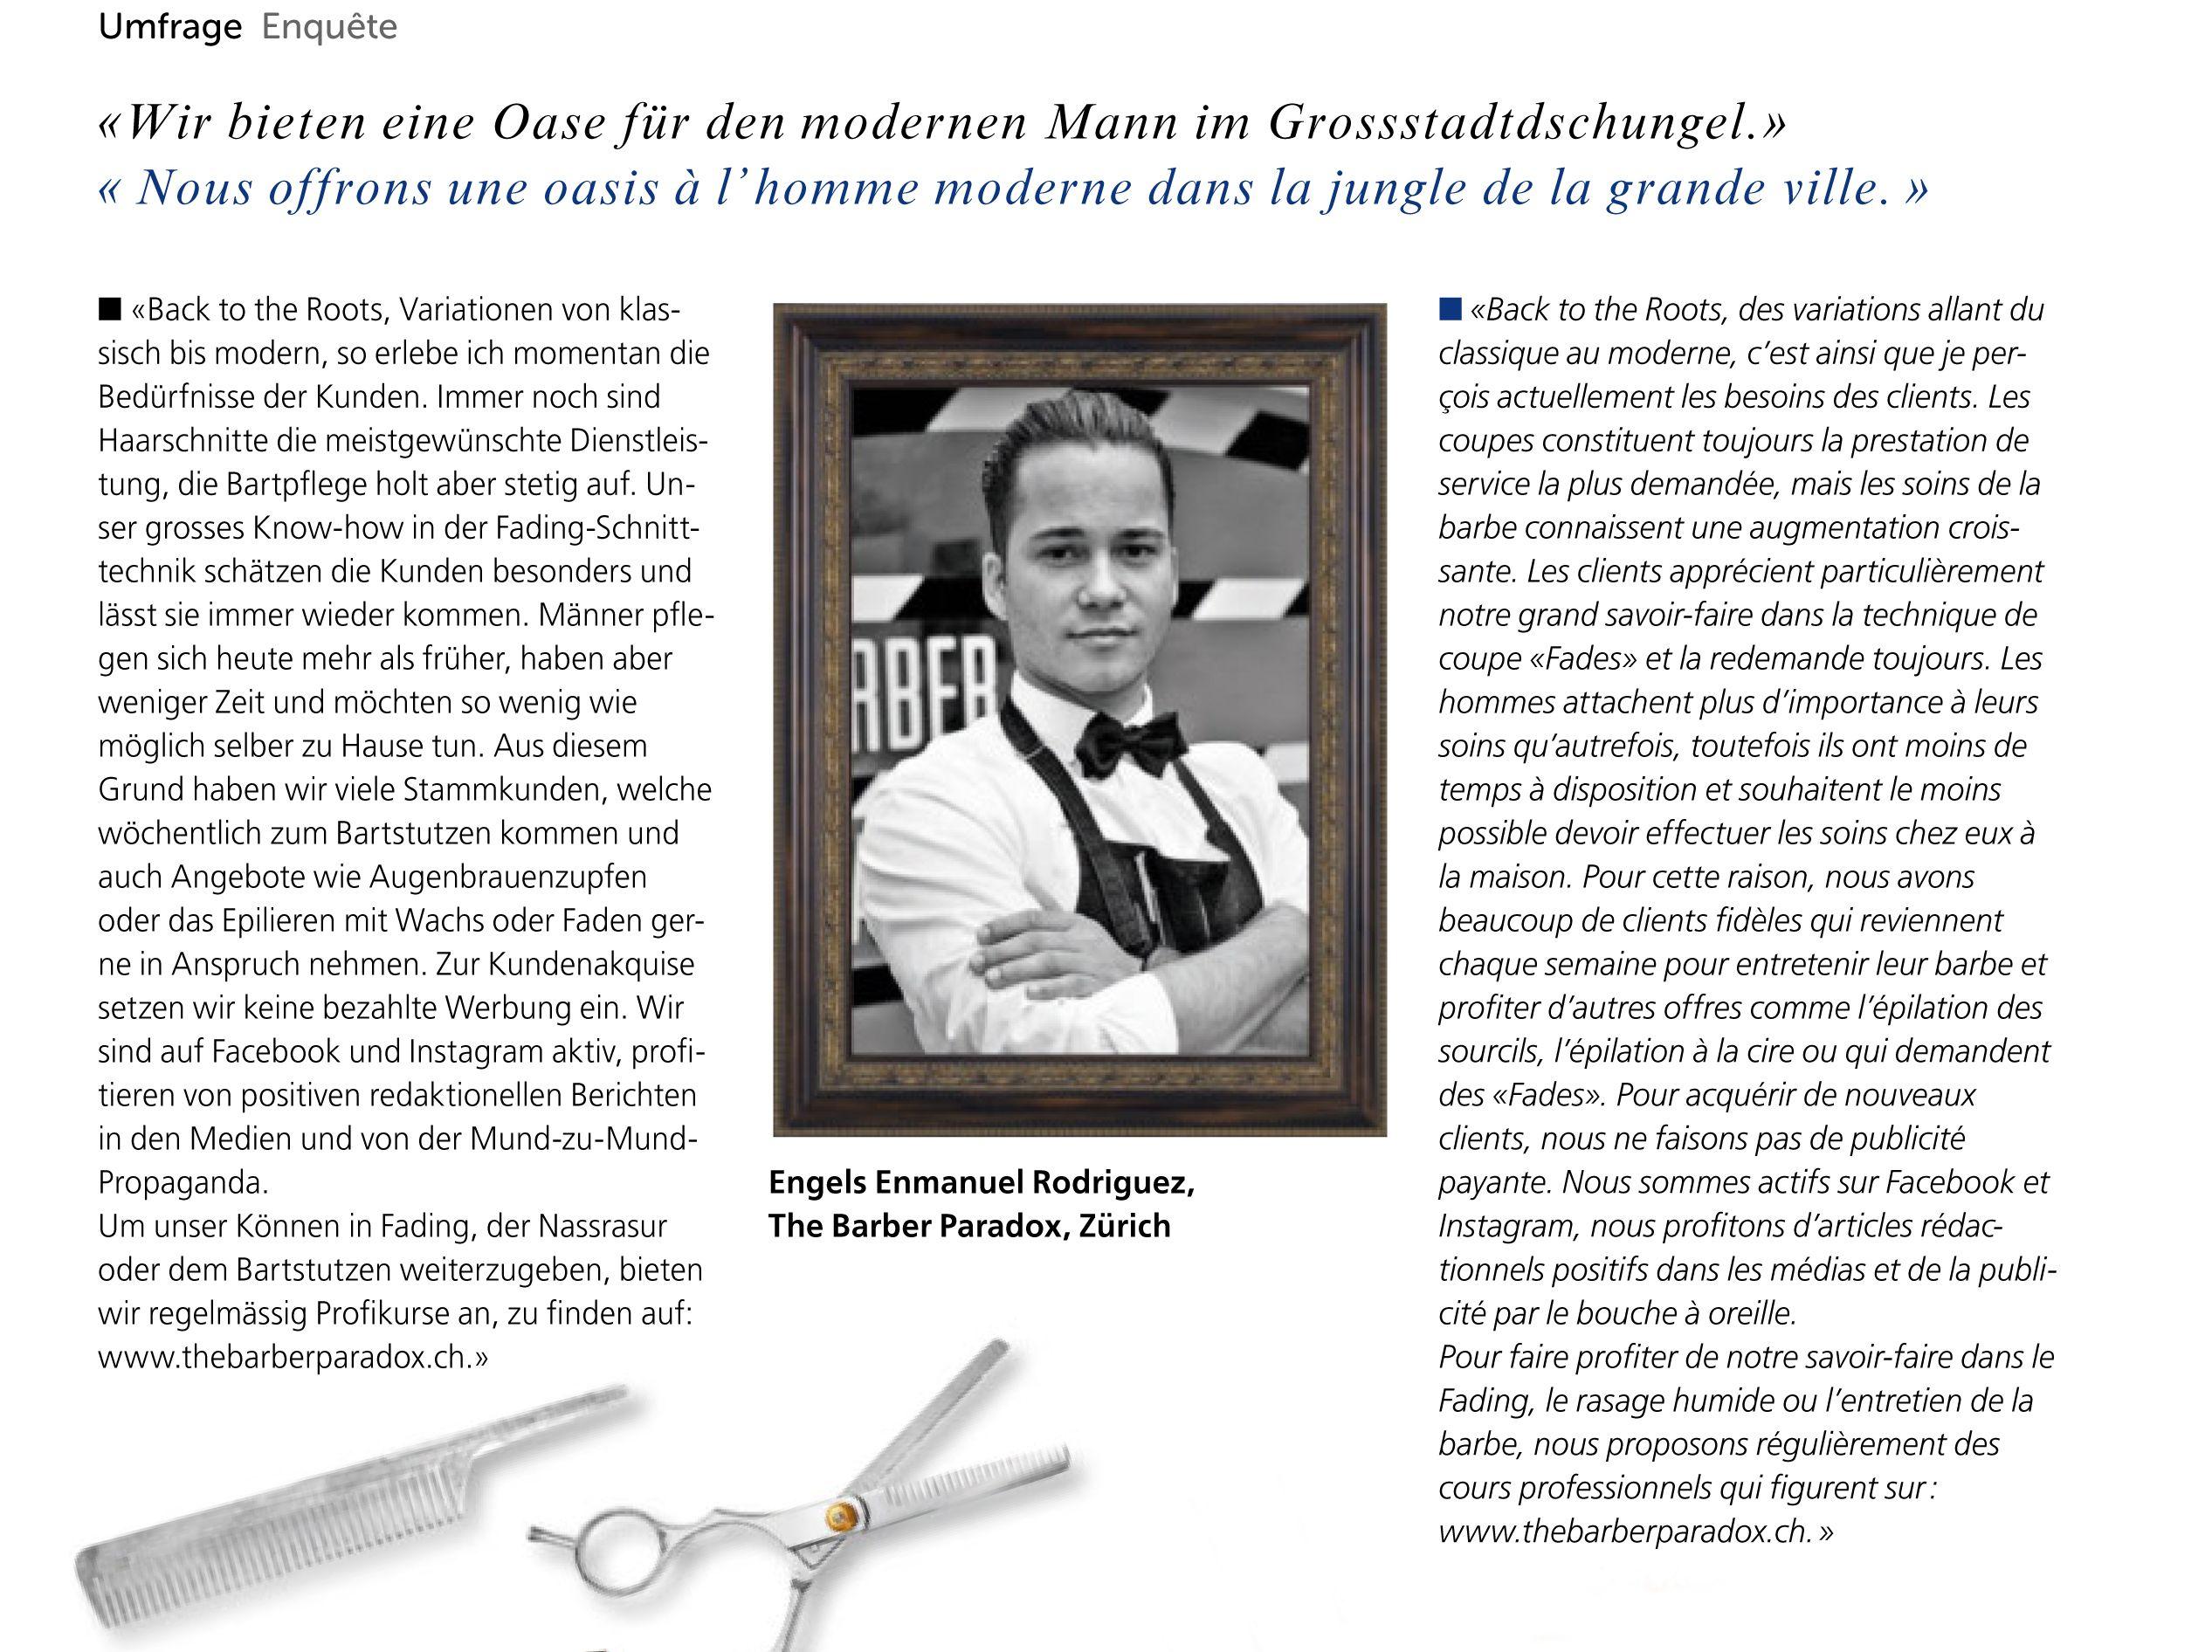 Best Barber In Zurich The Barber Paradox